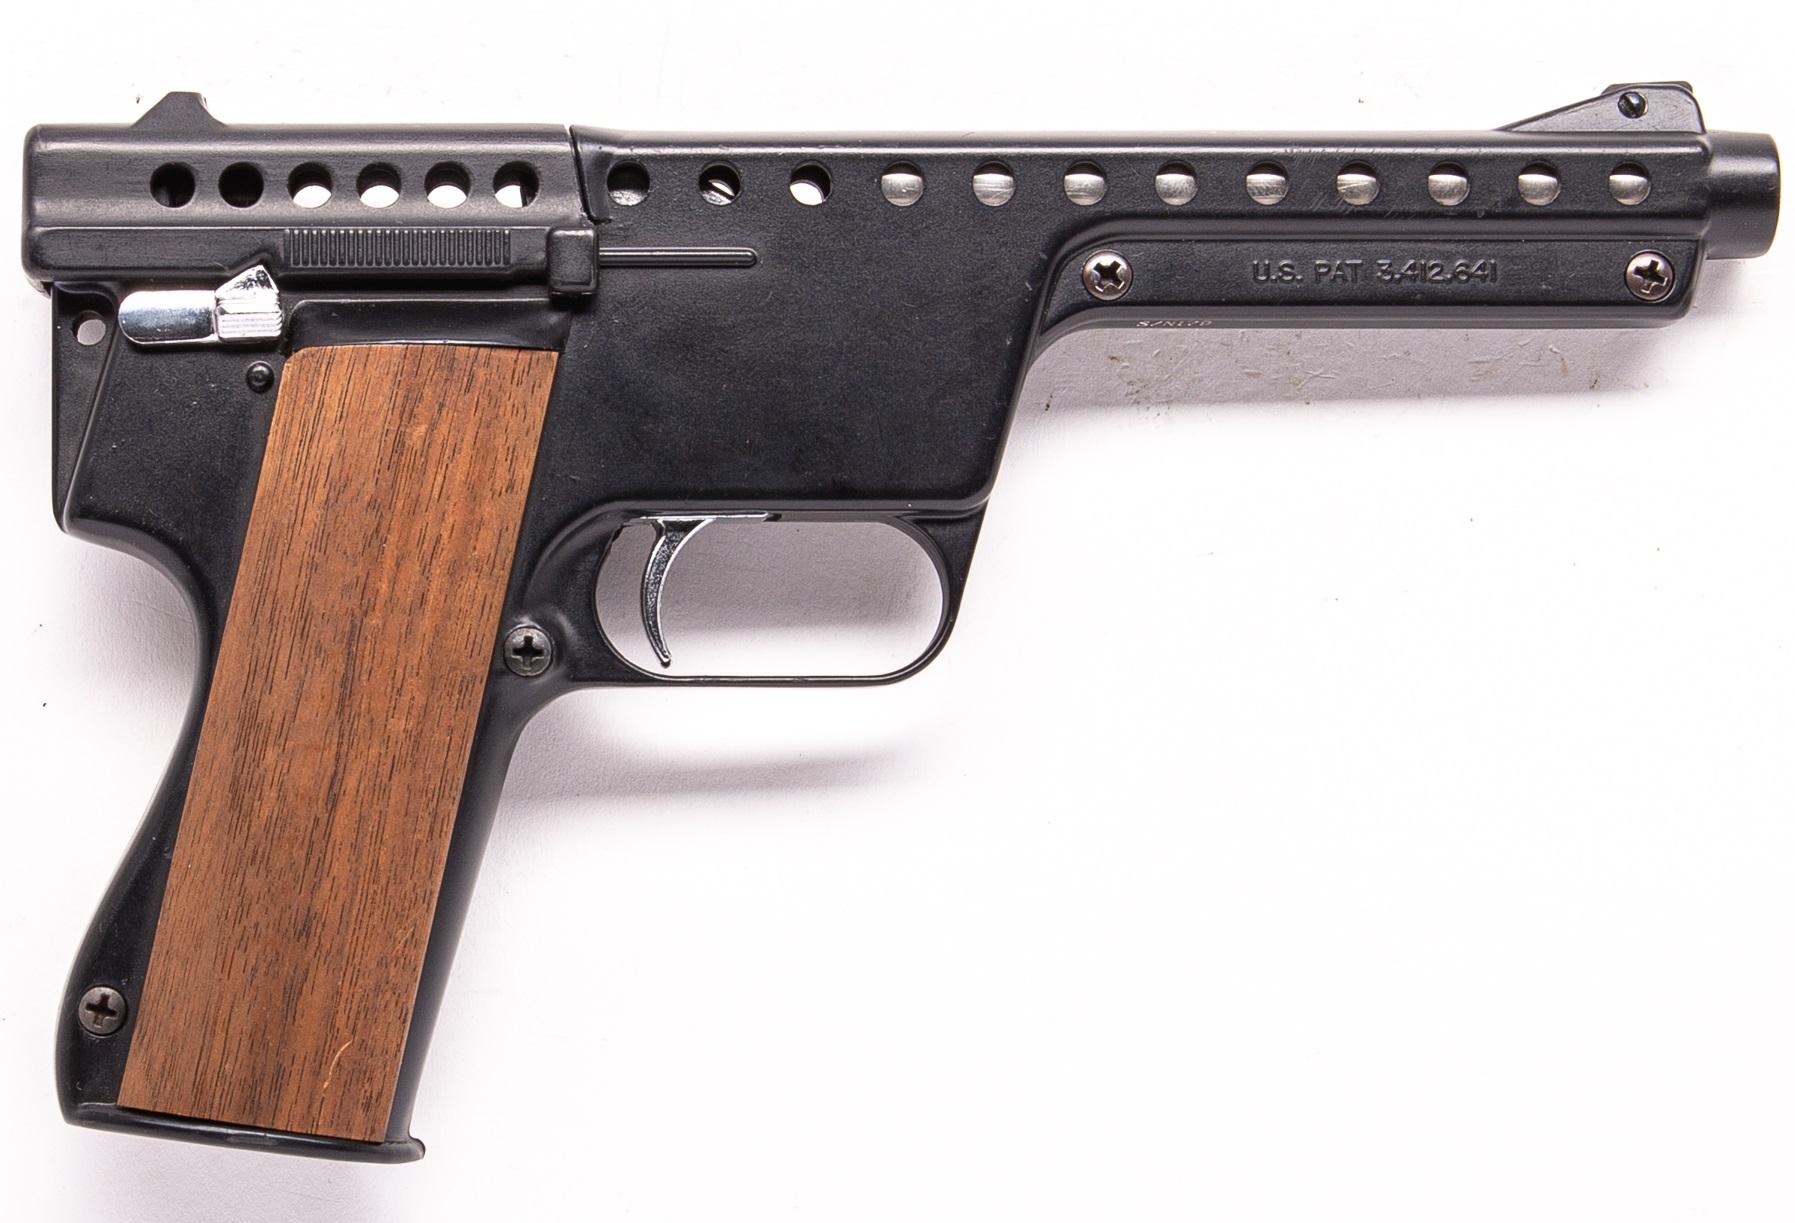 Gyrojet Mark II rocket pistol